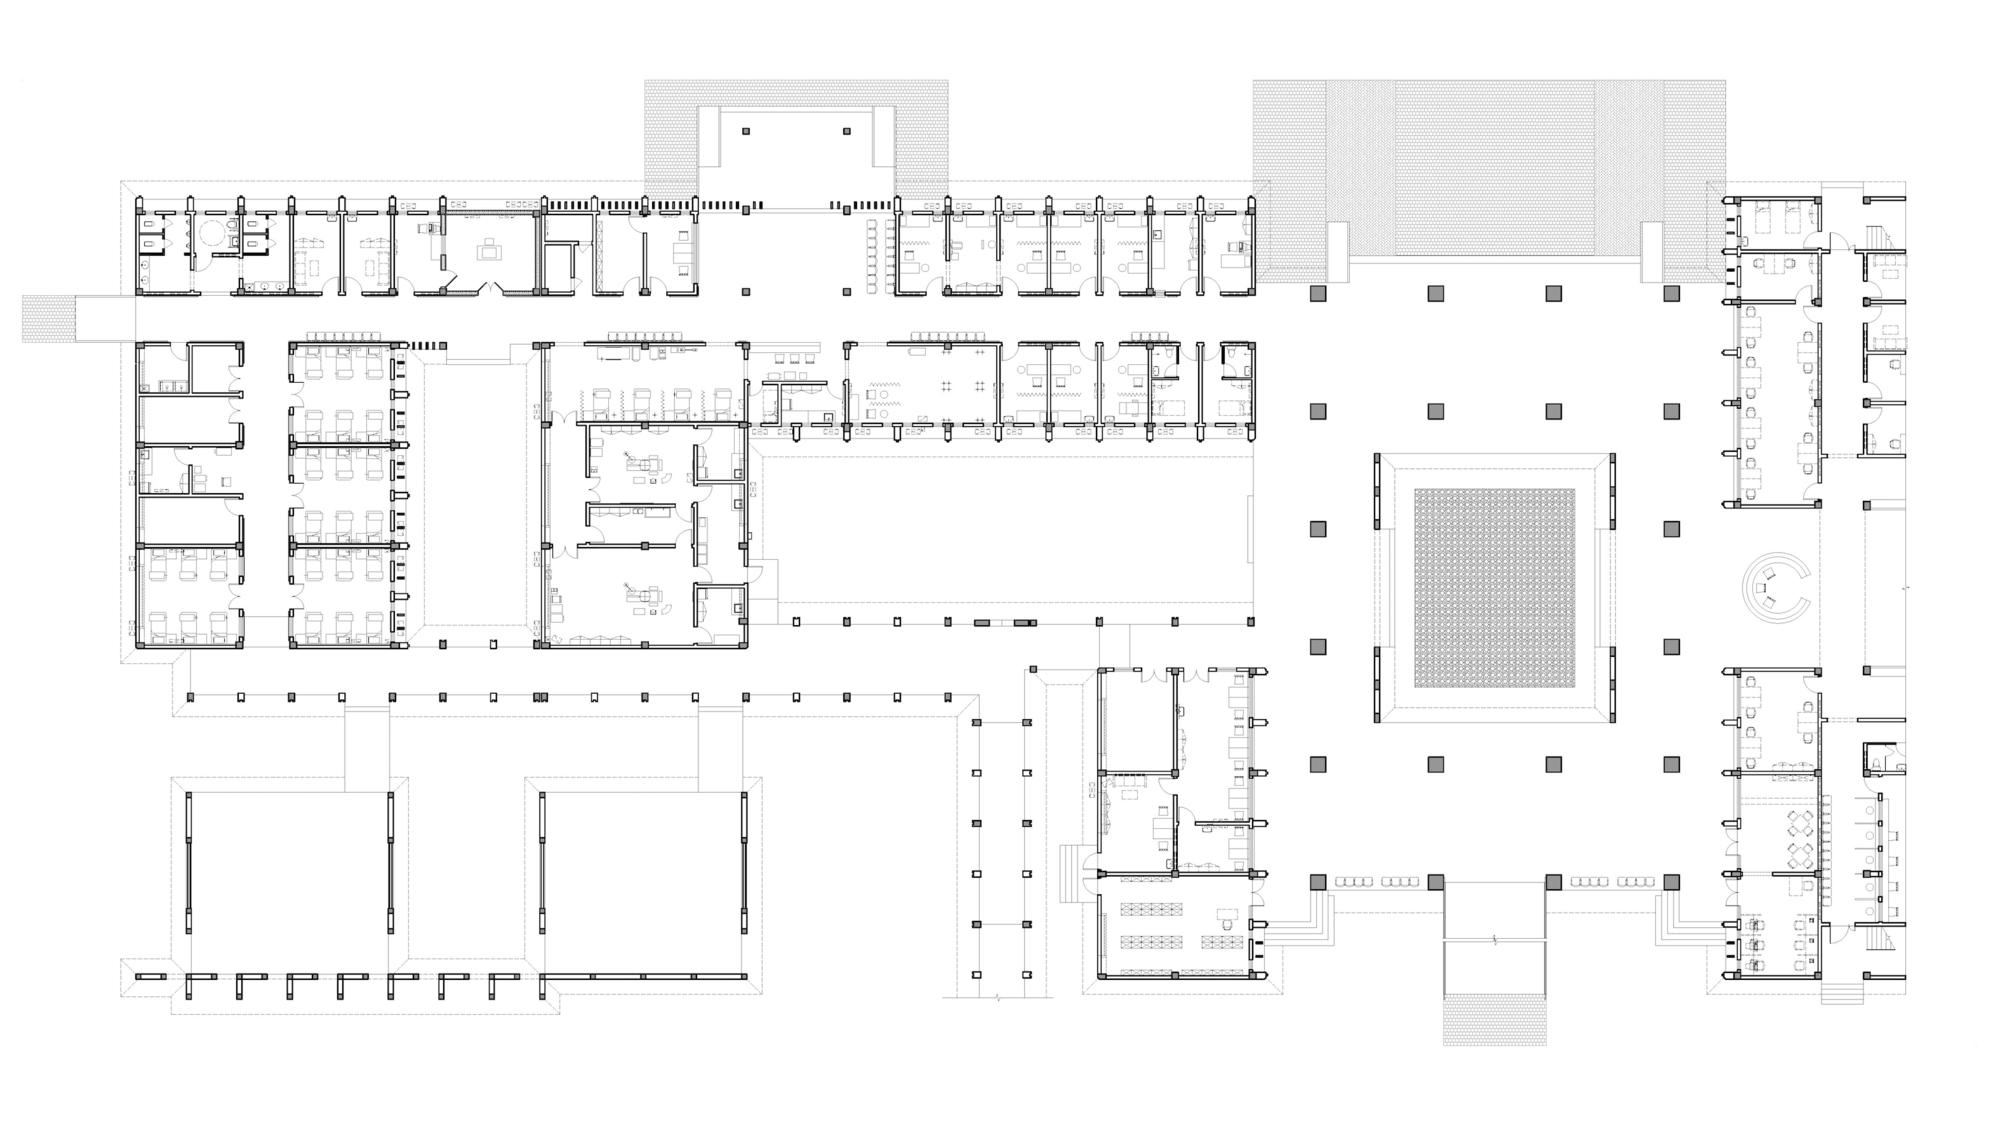 hight resolution of general hospital of niger cadi ground floor plan